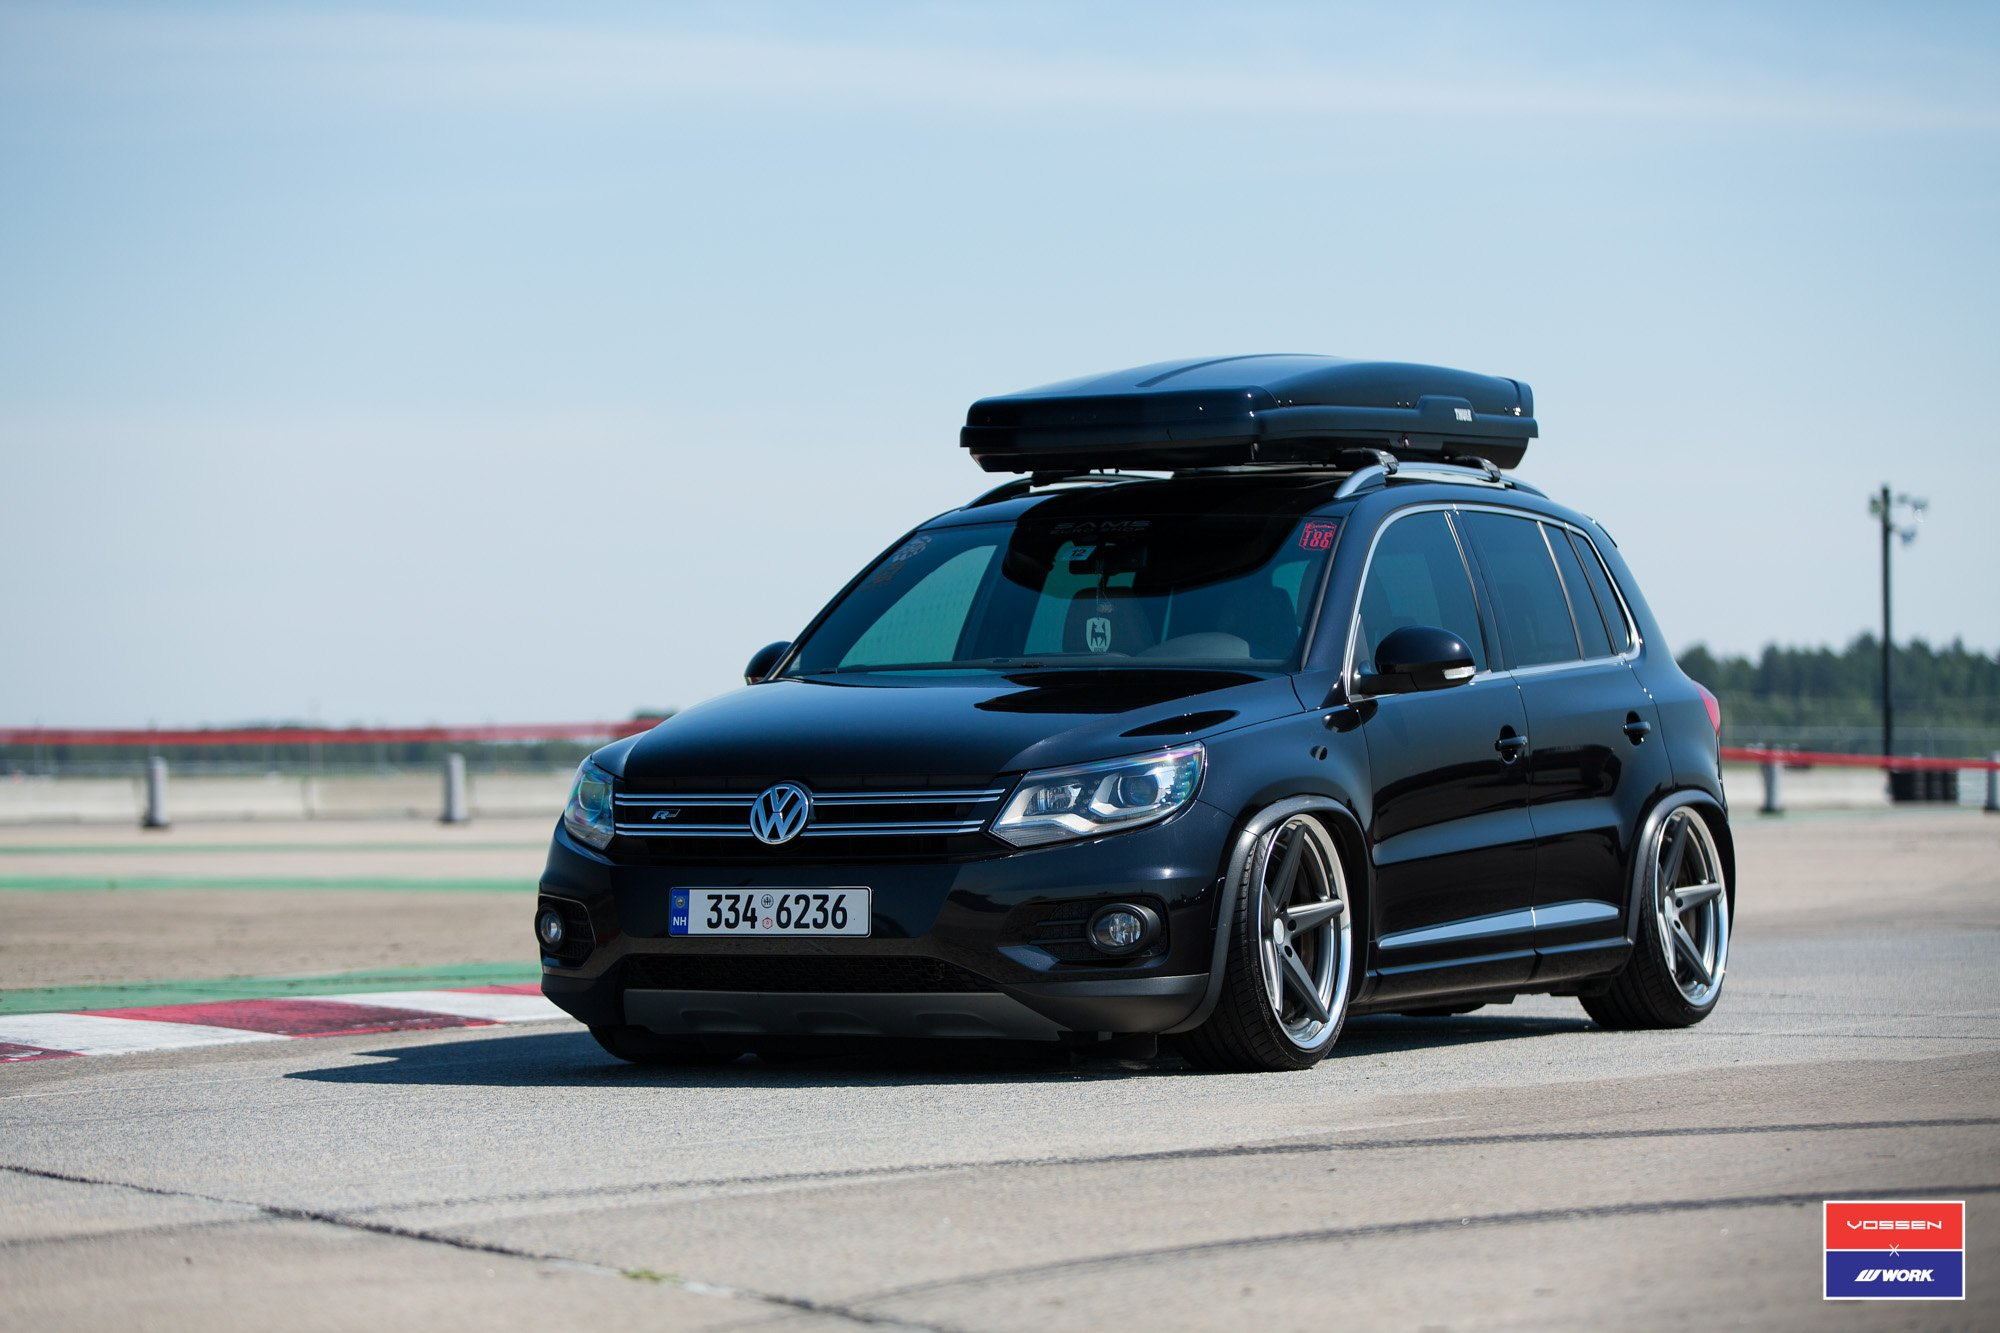 Black Volkswagen Tiguan Boasts Thule Roof Rack And More